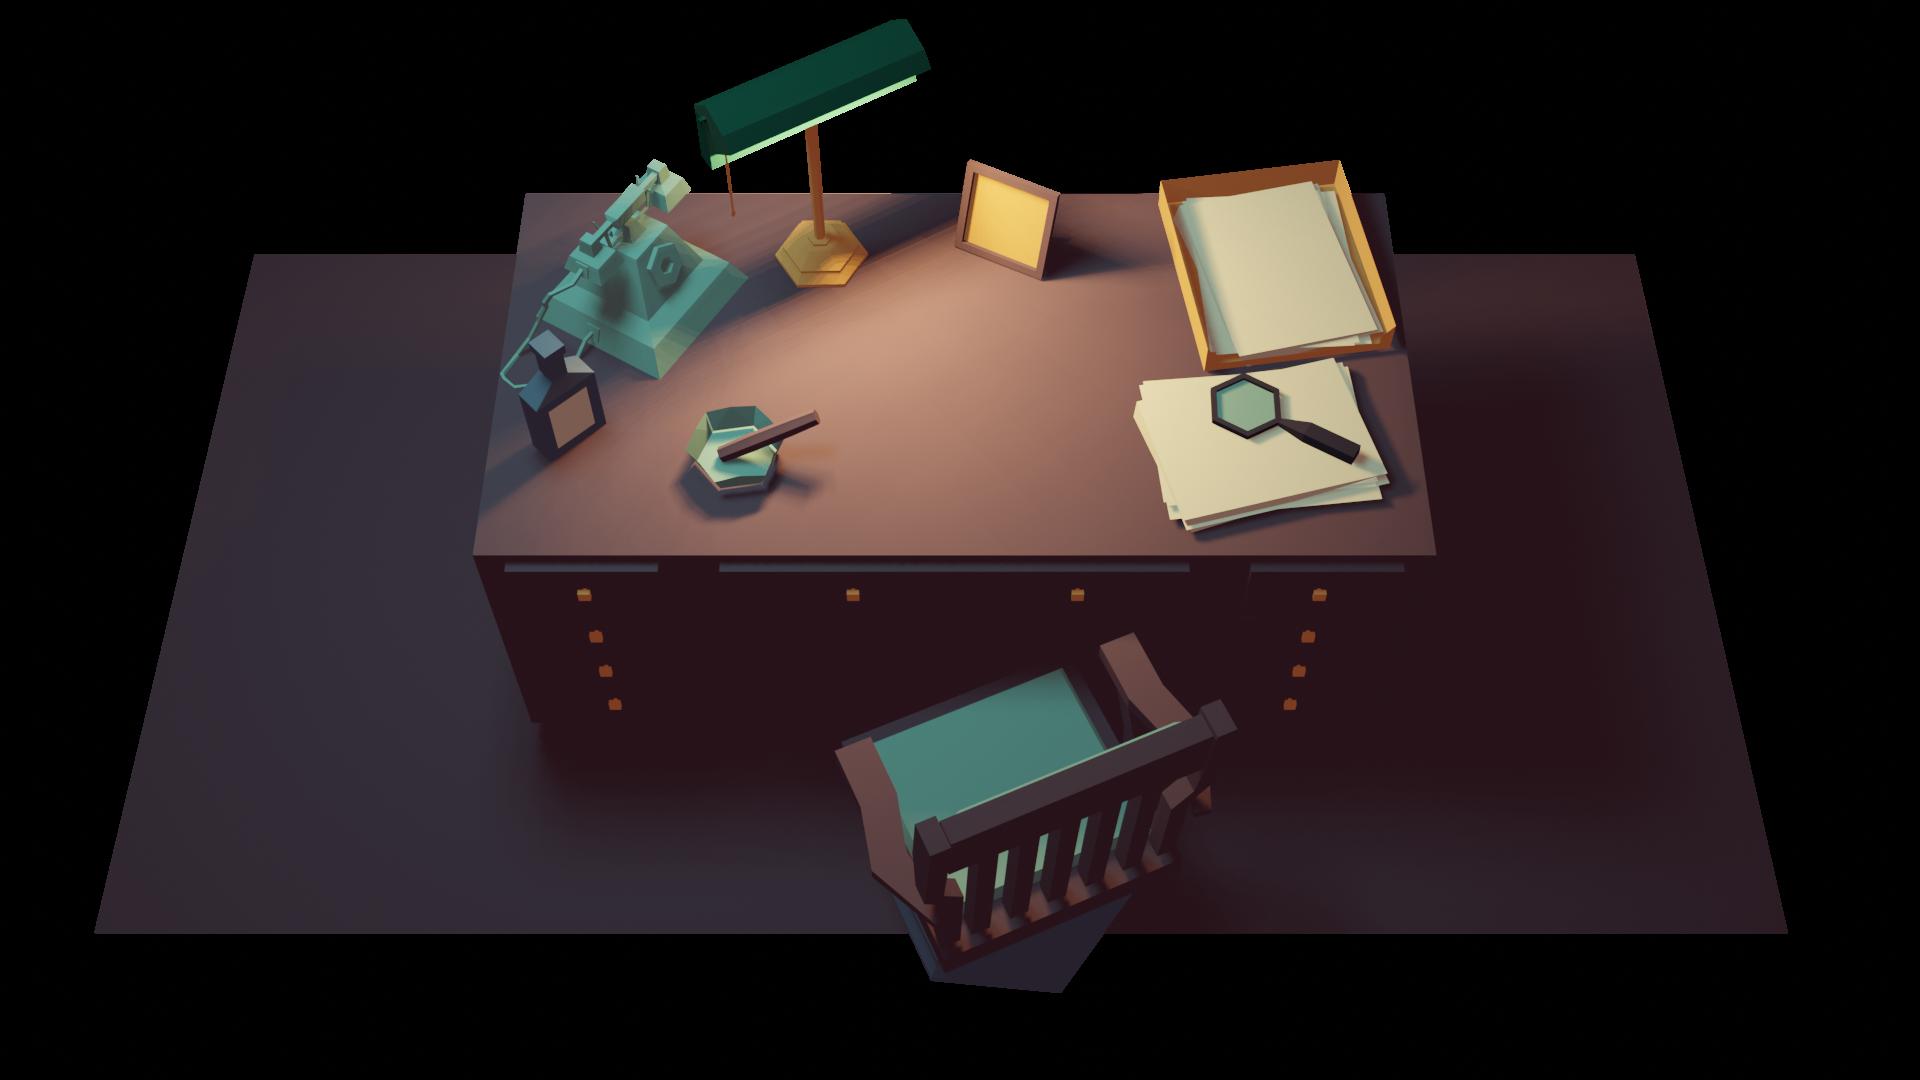 Desk detective top view